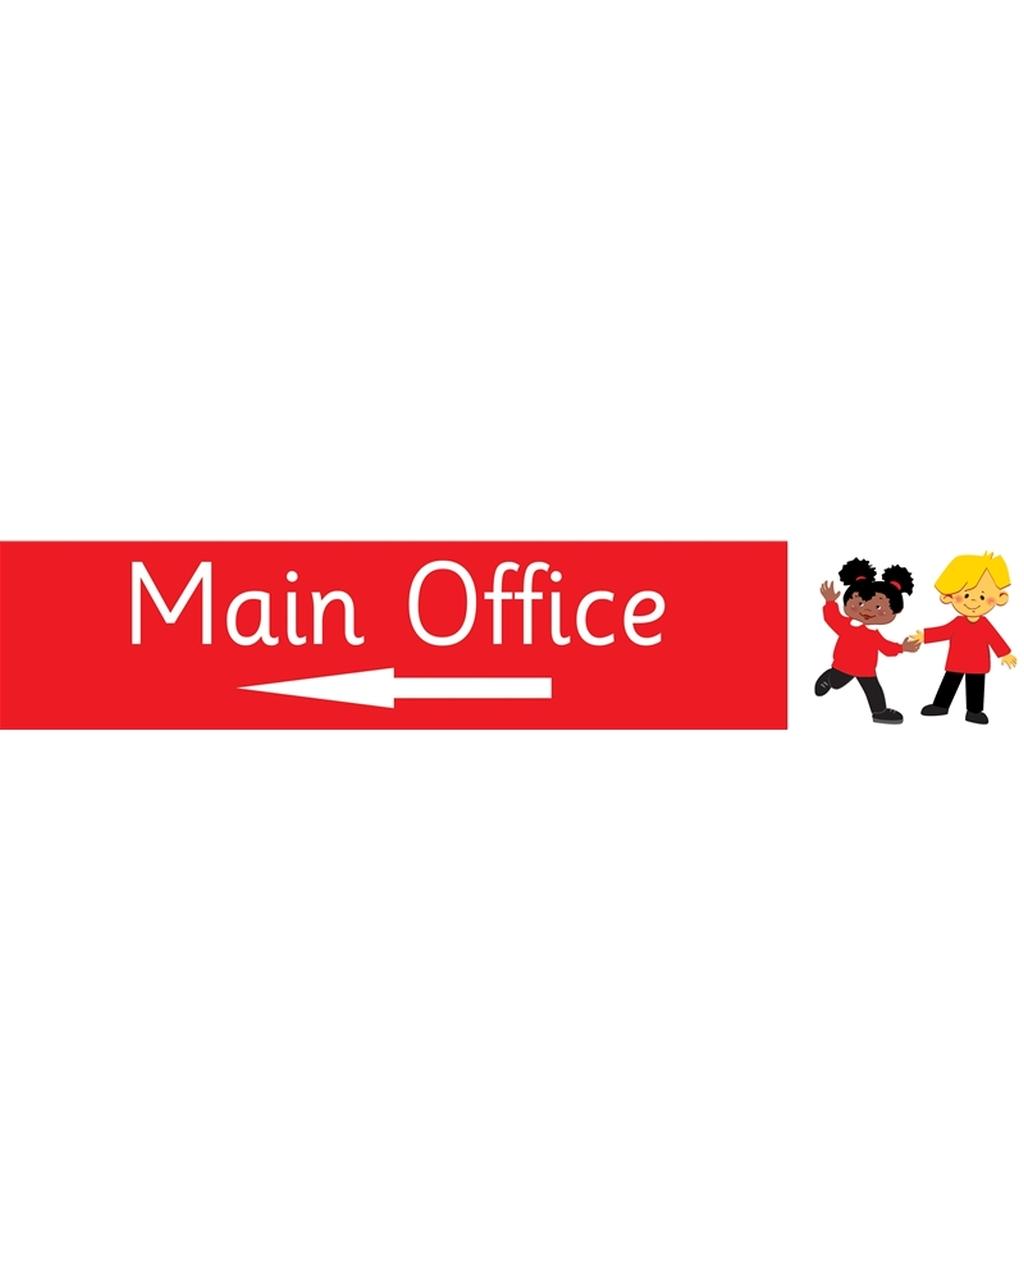 Main Office Left Arrow Sign Green